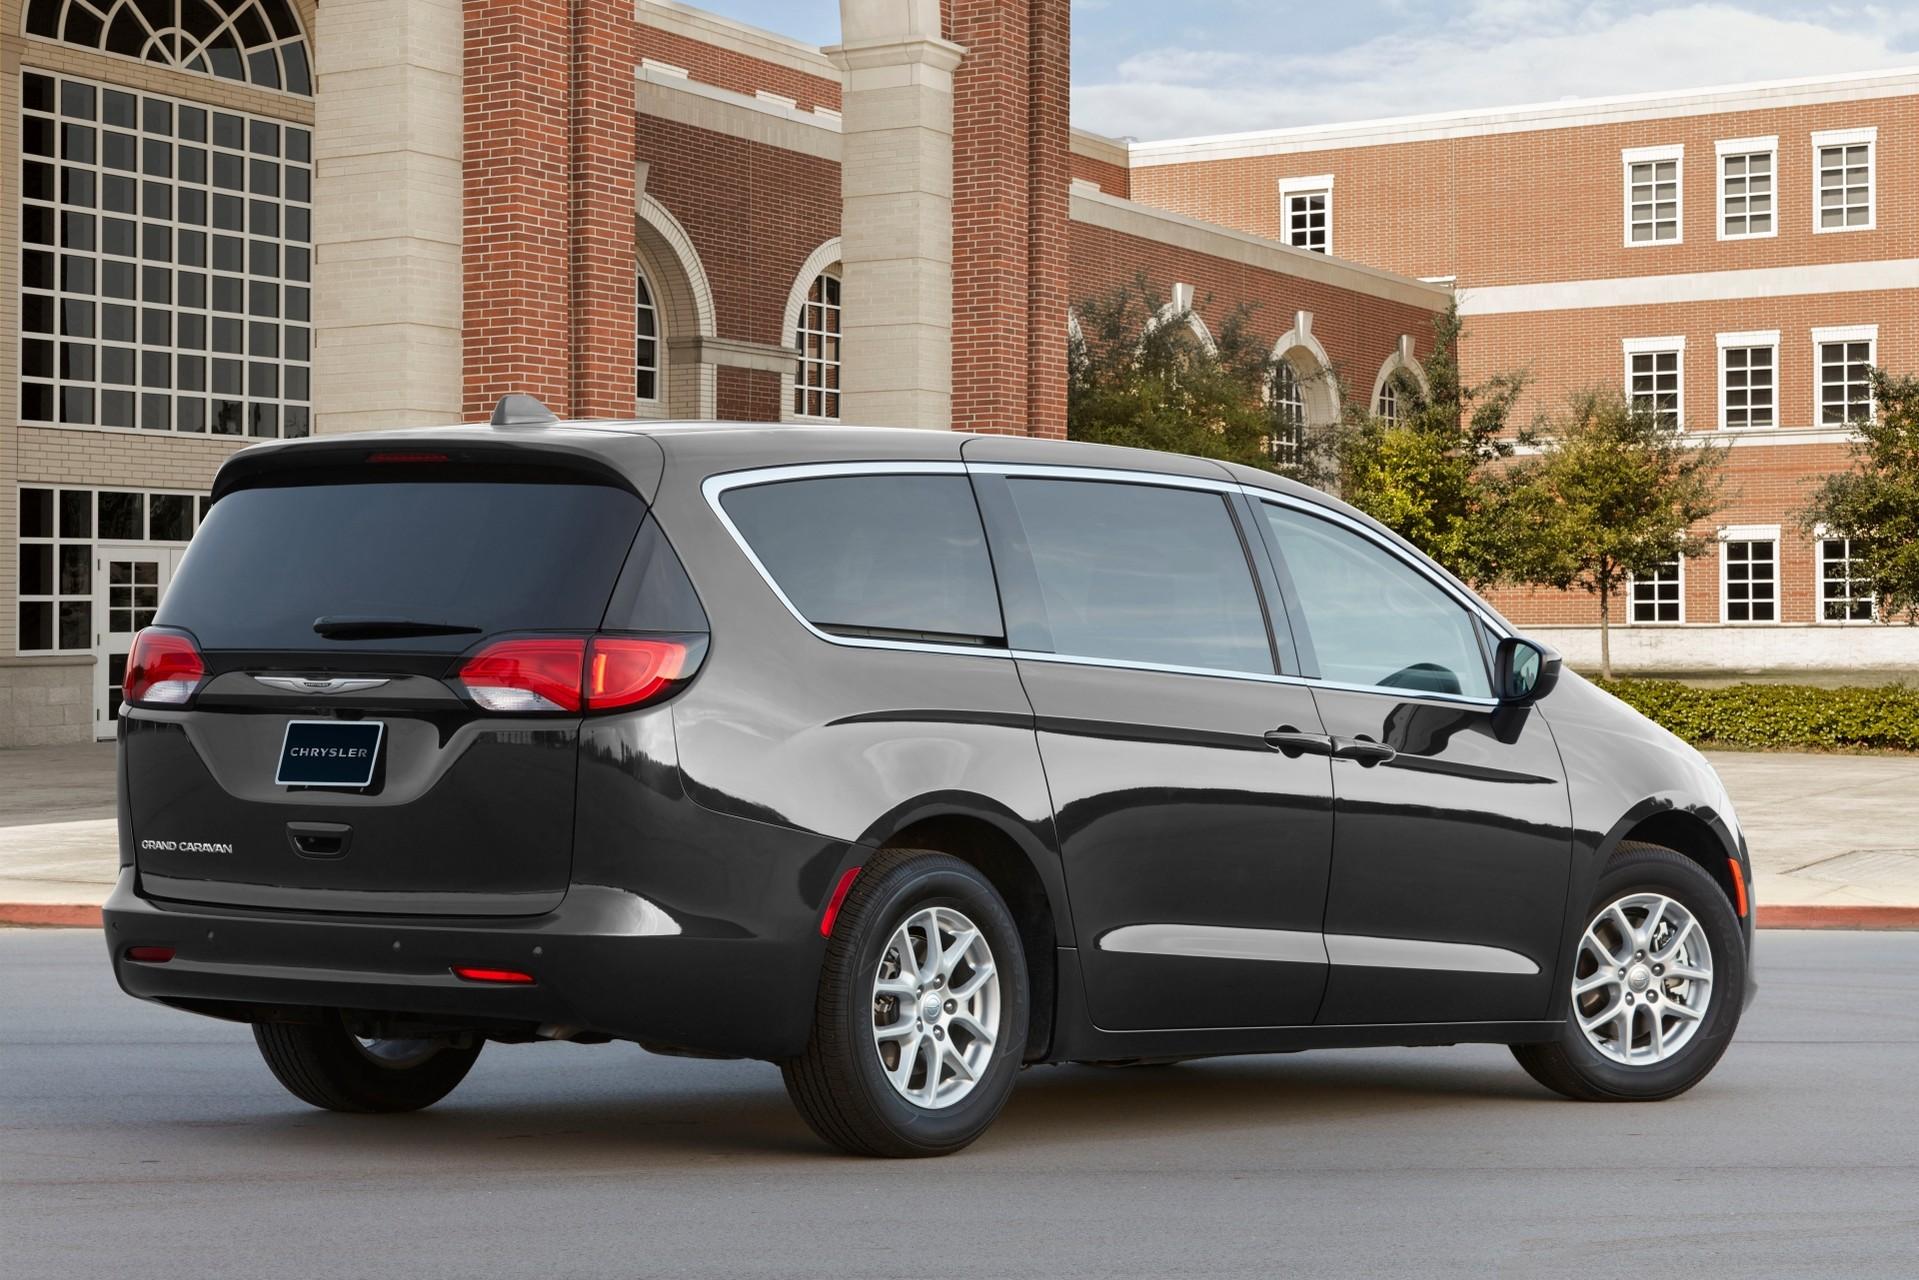 2021 Dodge Caravan Review